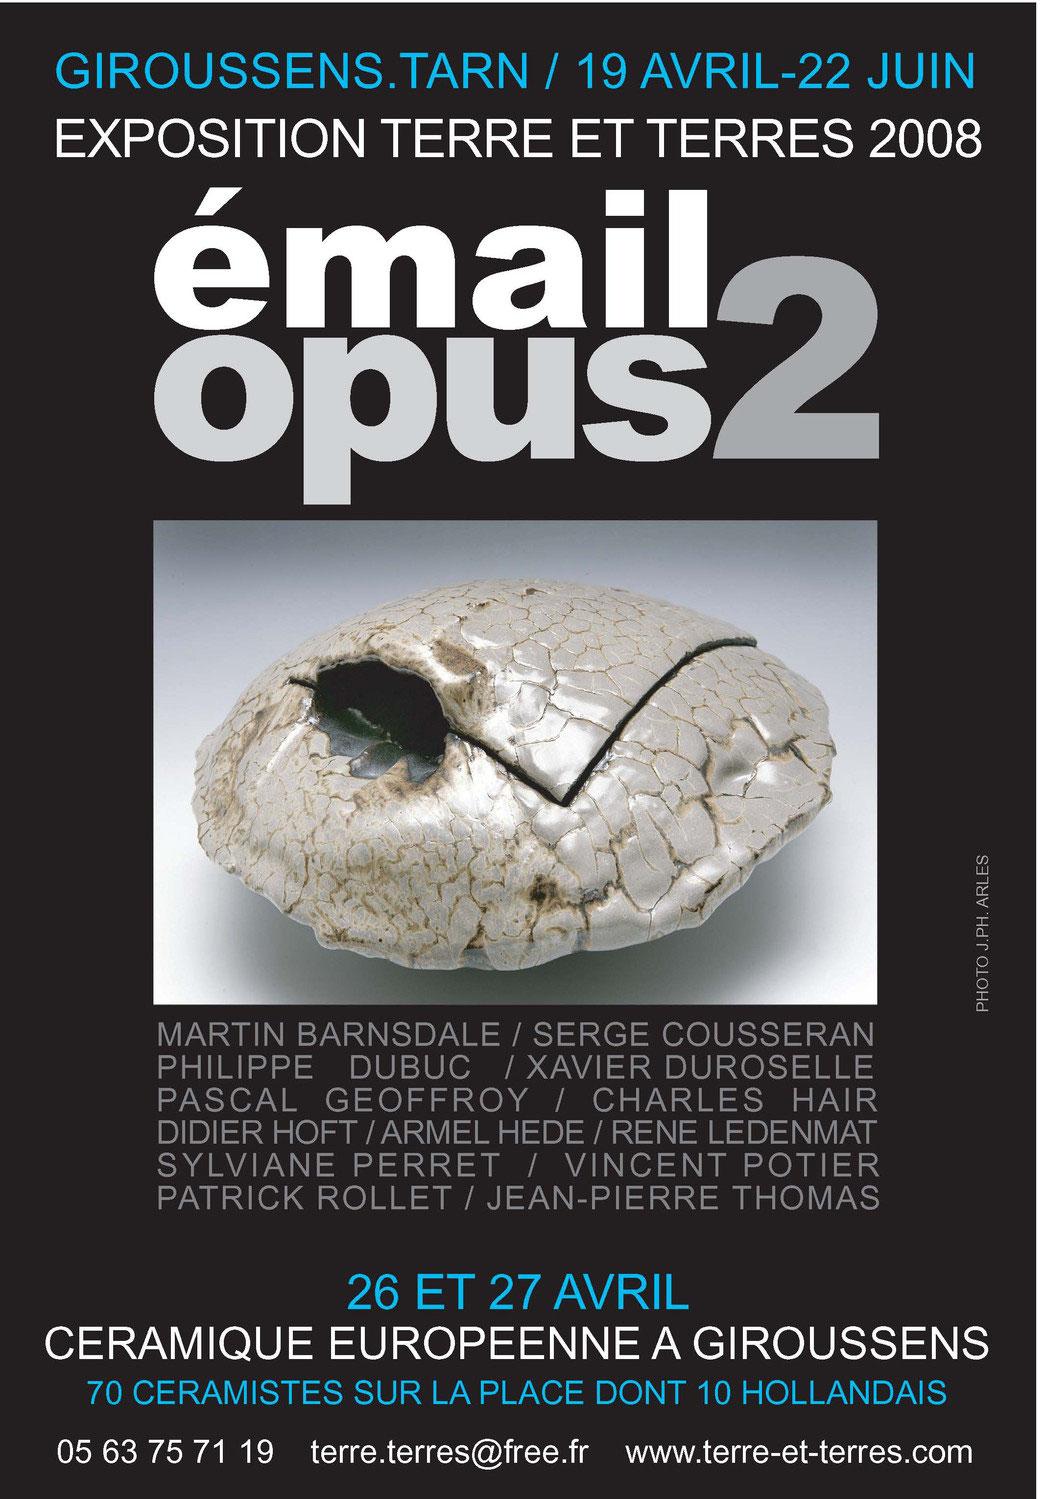 affiche 6 | Terre et Terres | Exposition | Exposition 2008 Email Opus 2 | Article | Terre et Terres | 23 juillet 2017